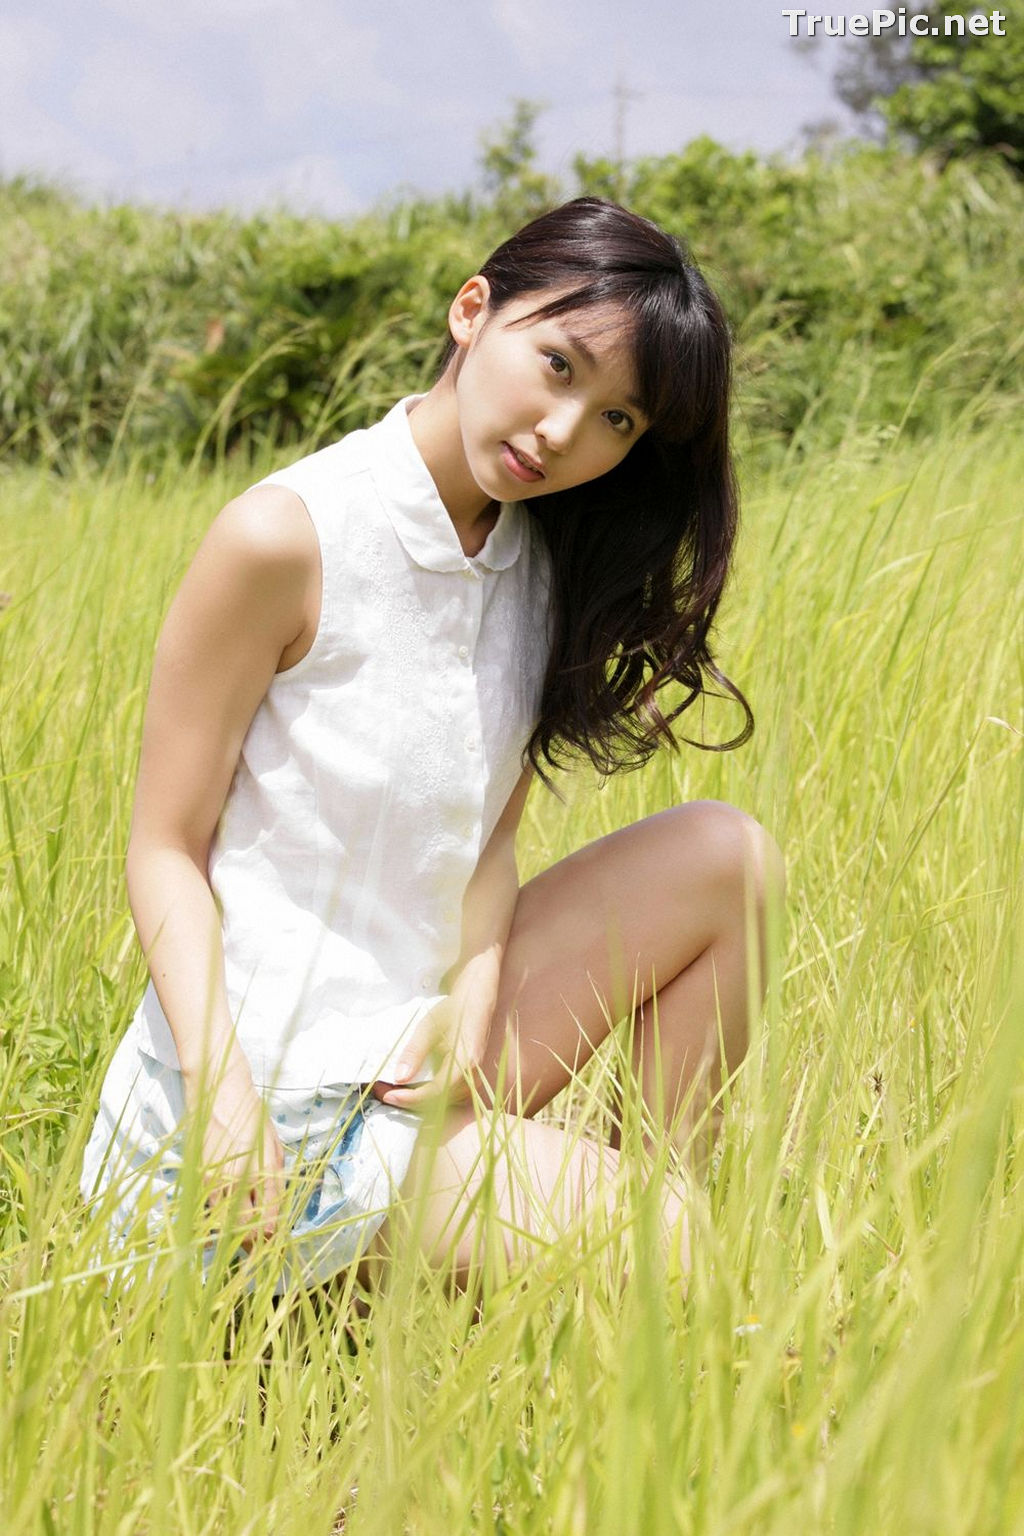 Image [YS Web] Vol.527 - Japanese Gravure Idol and Singer - Risa Yoshiki - TruePic.net - Picture-7